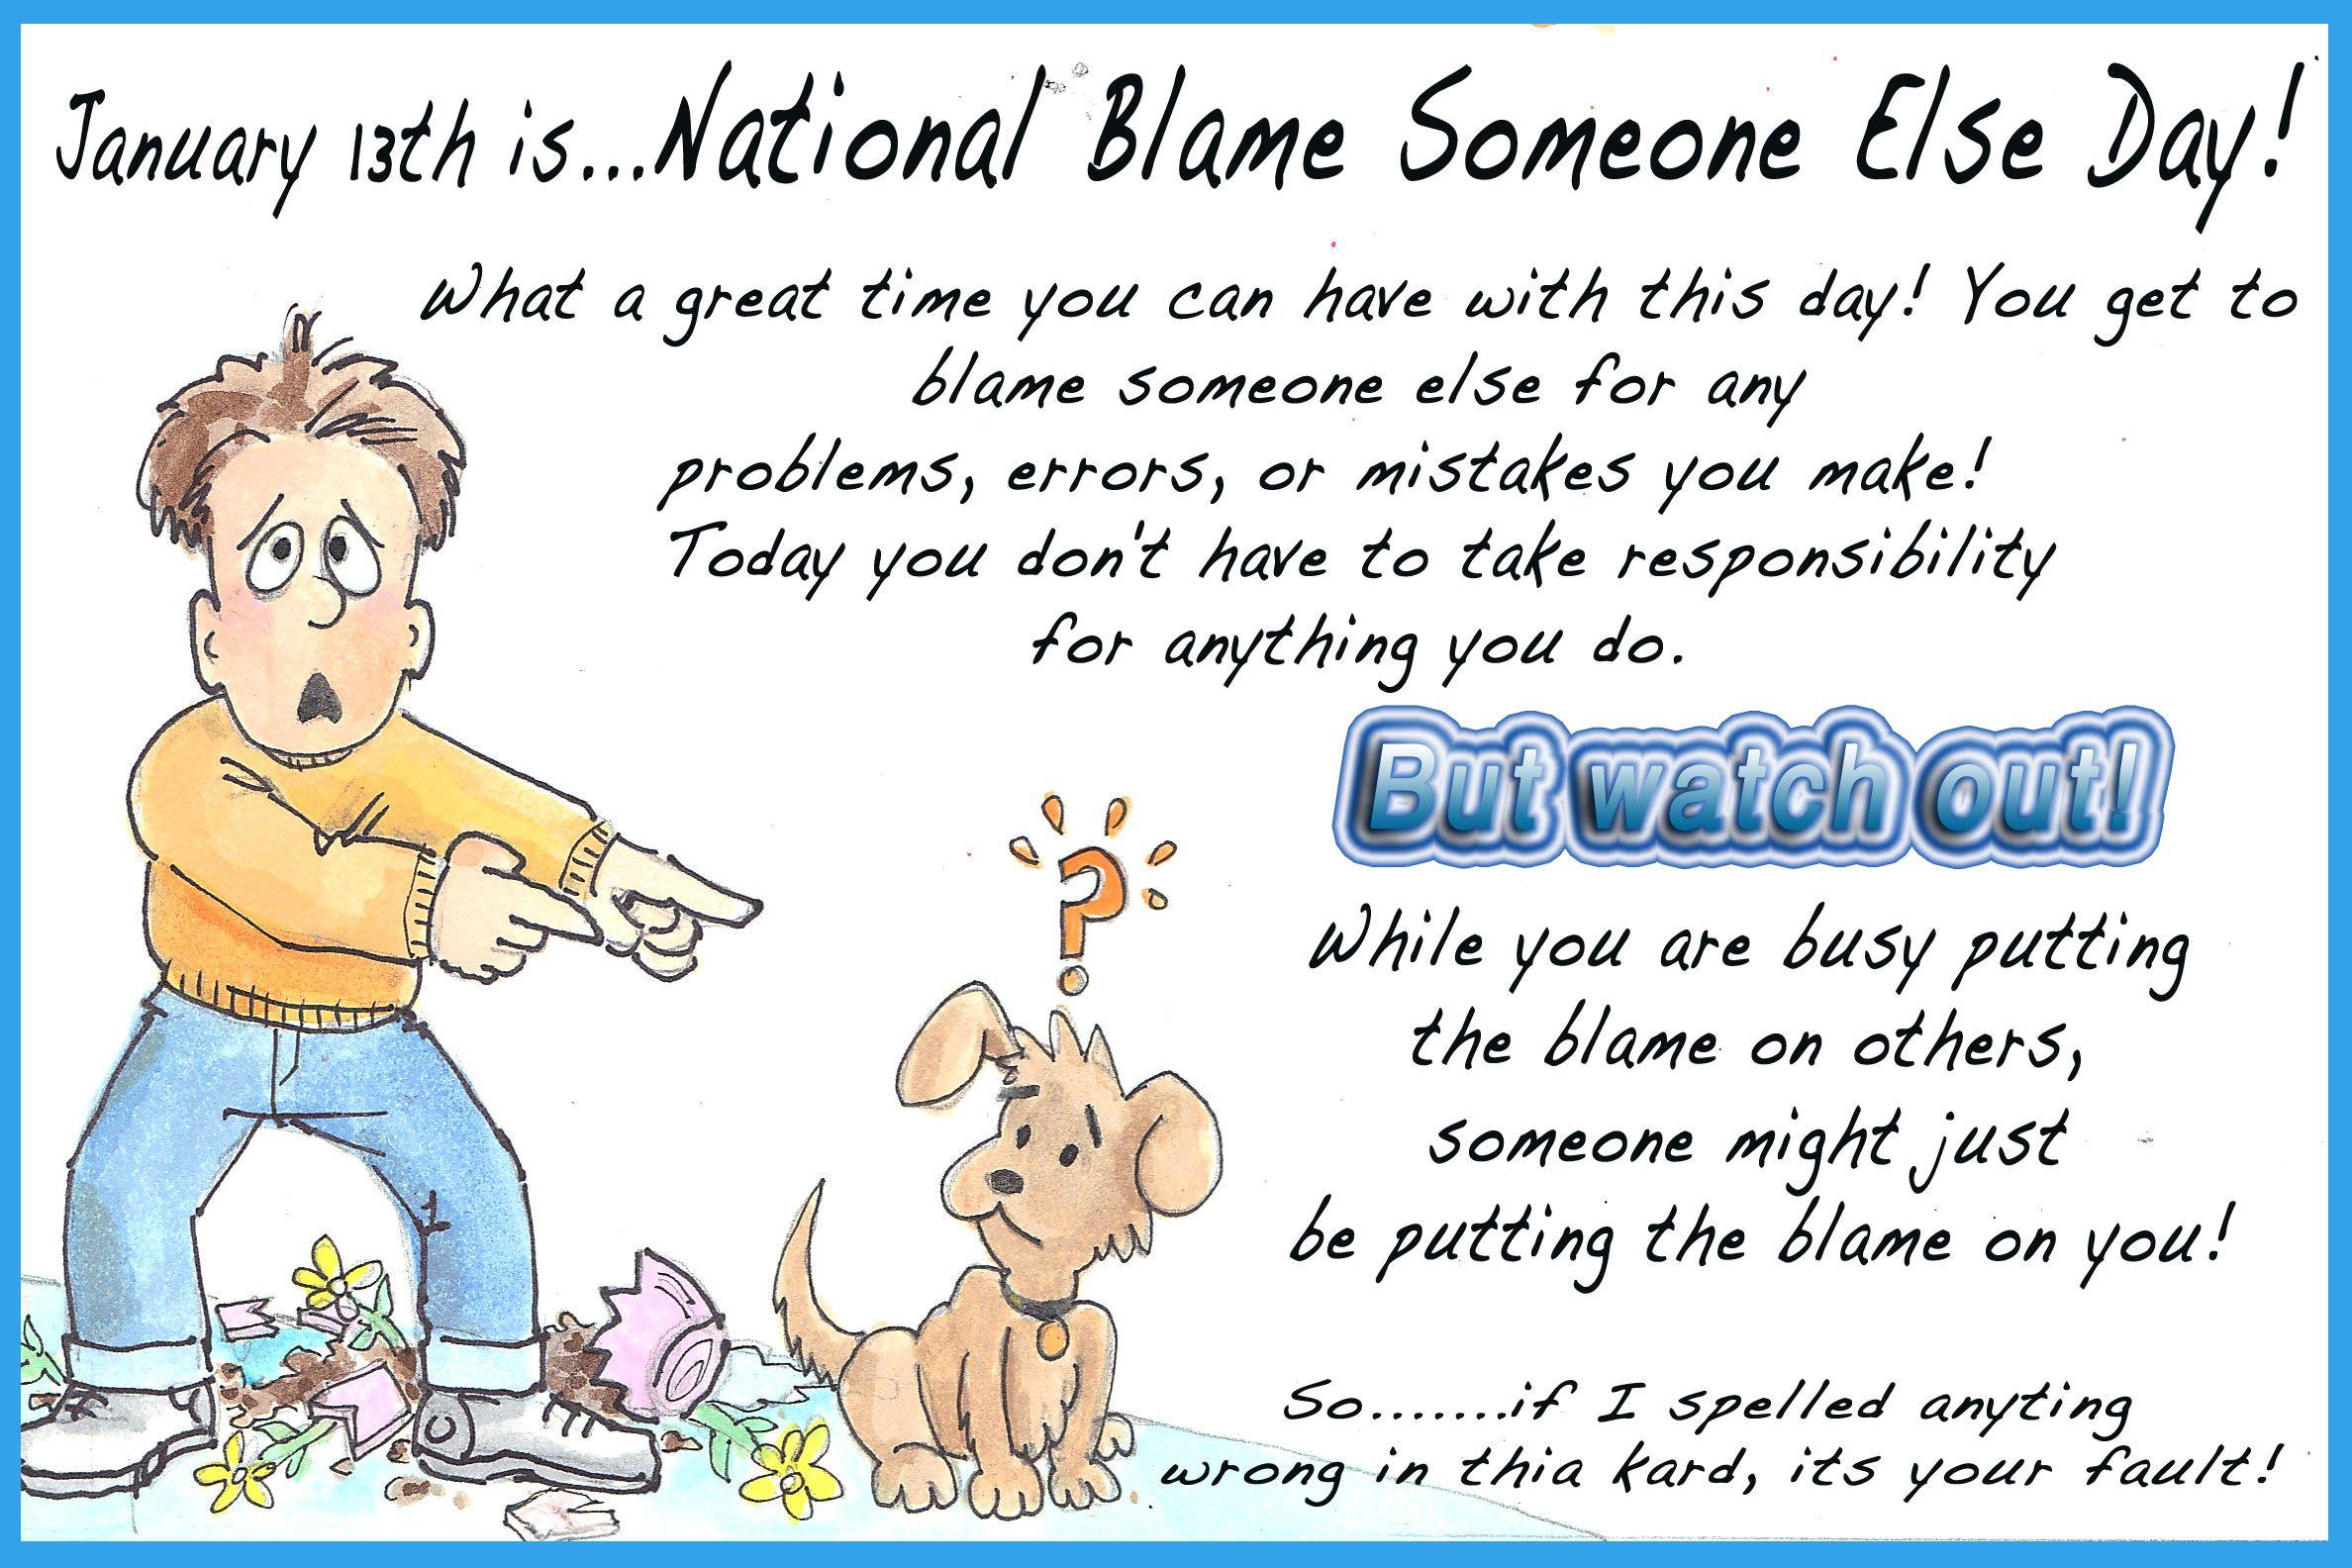 Blame Someone